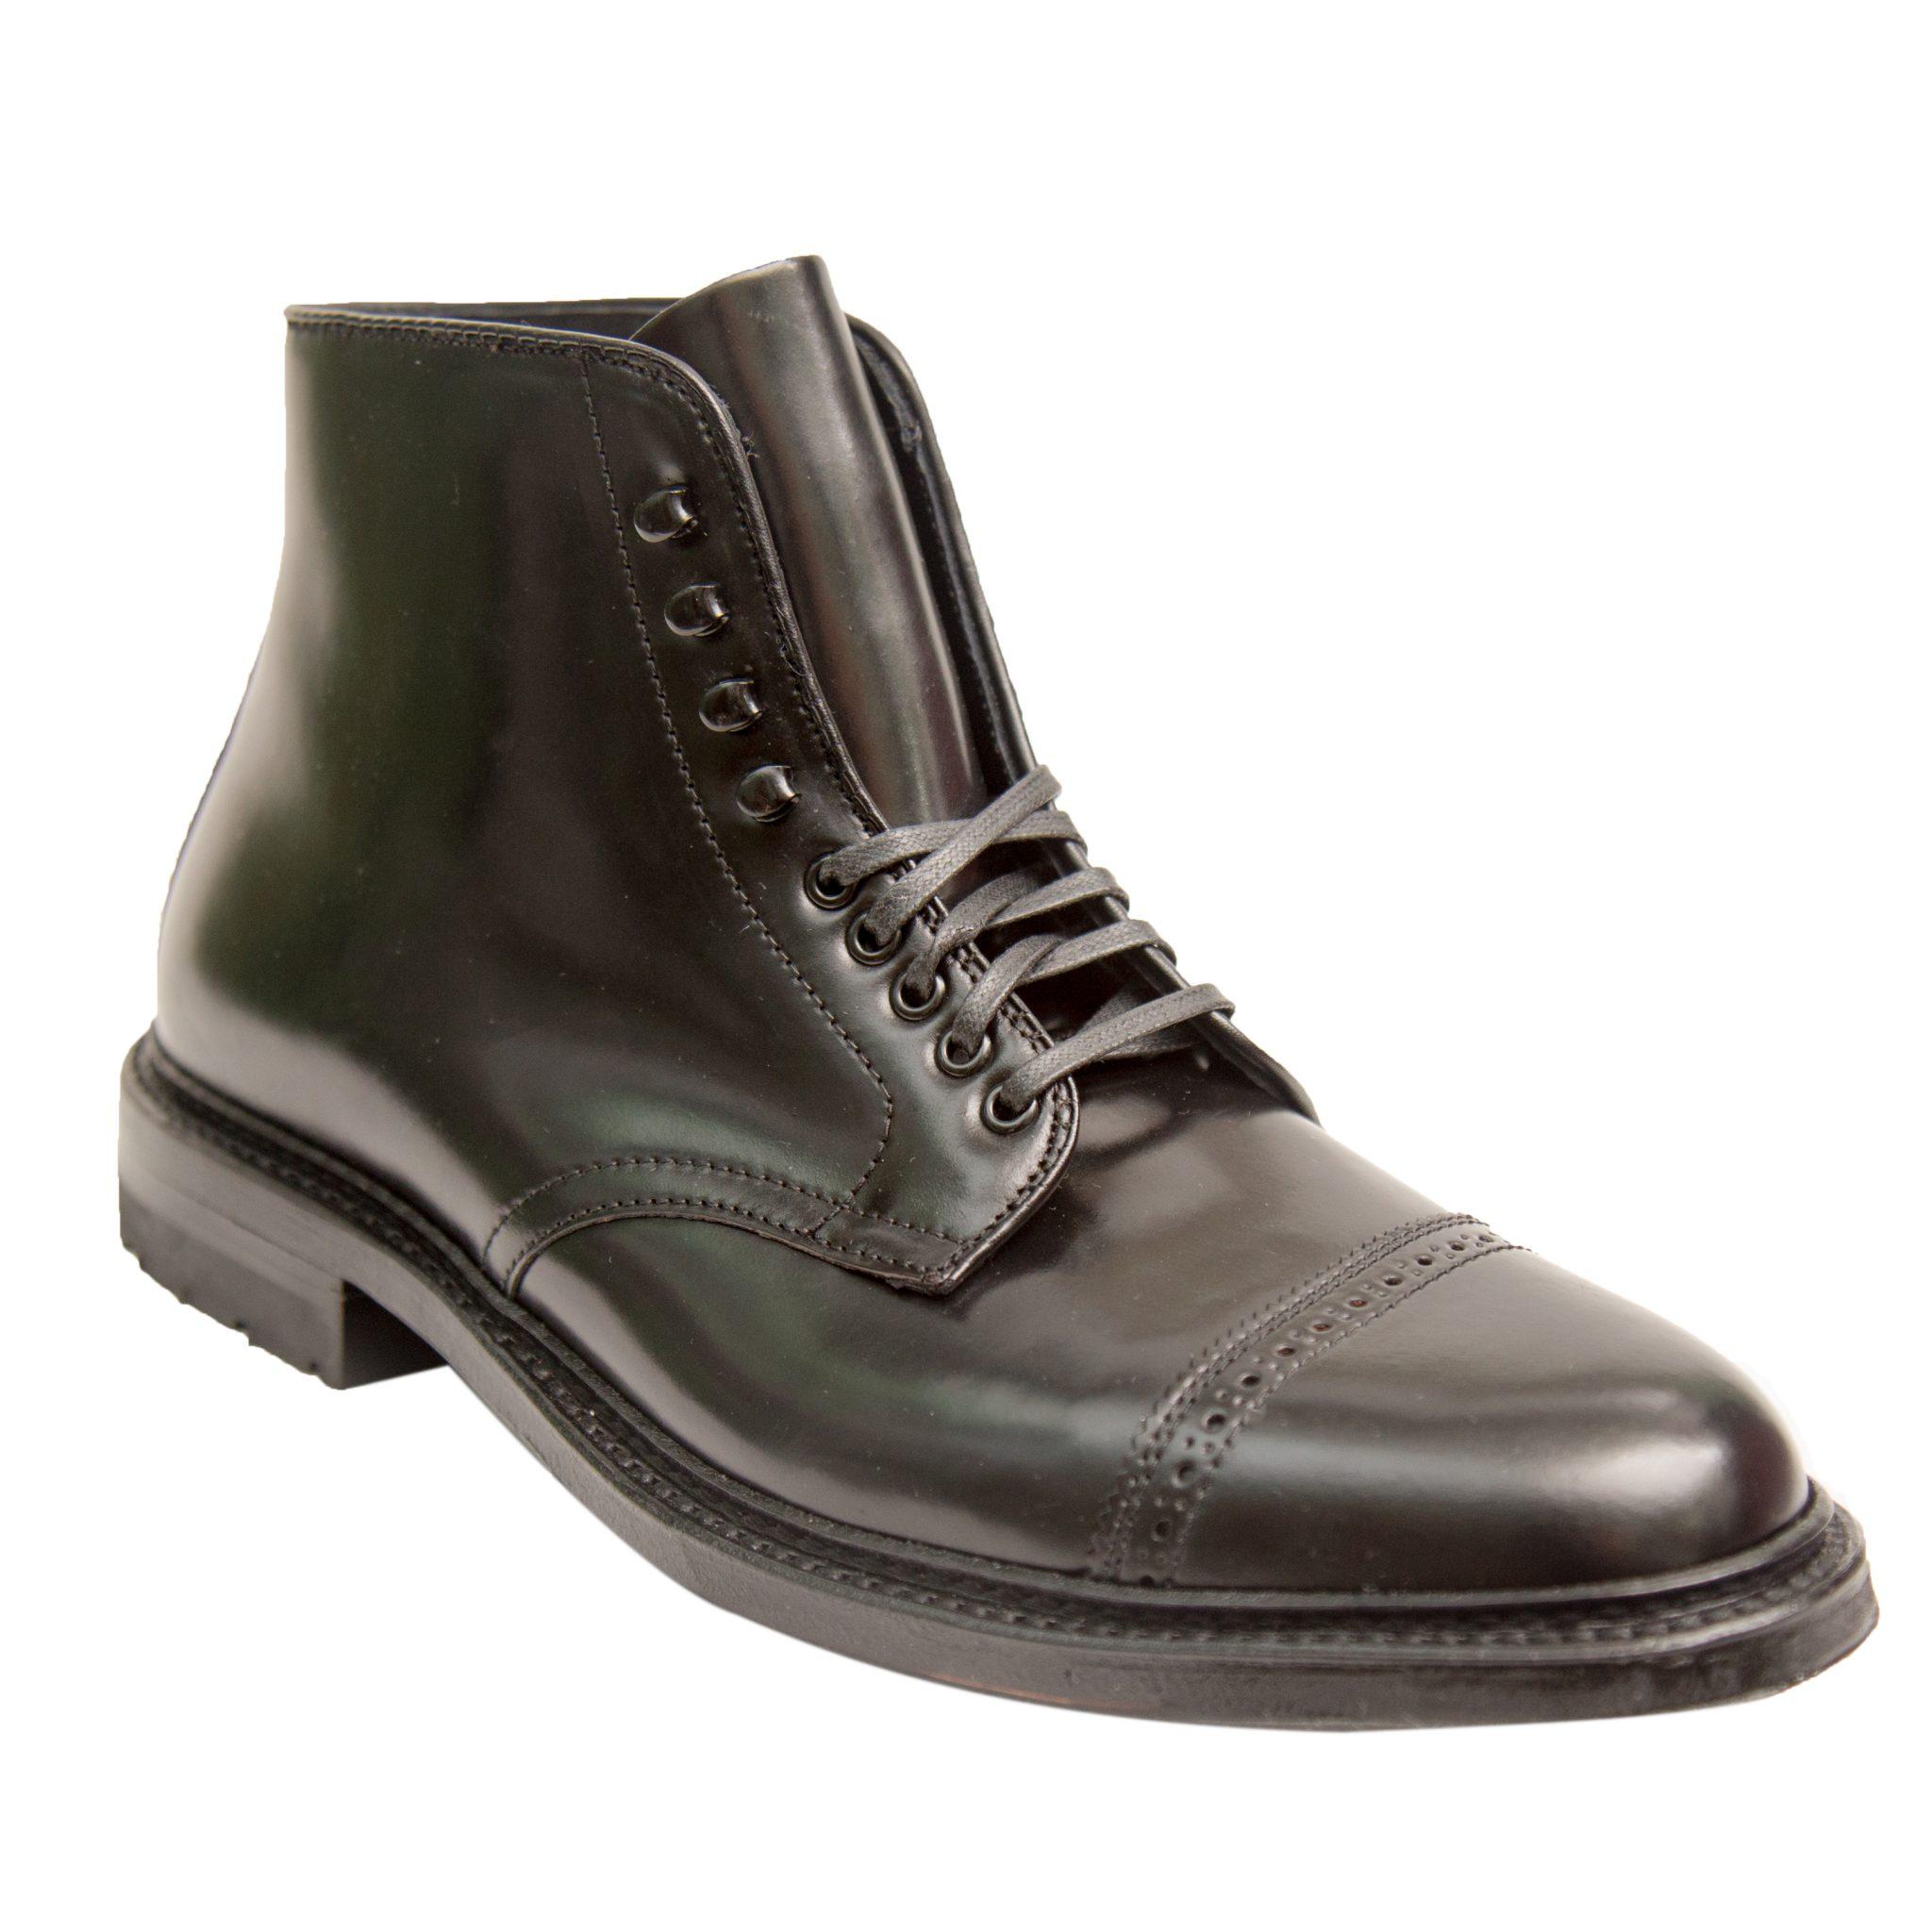 jumper boot black shell